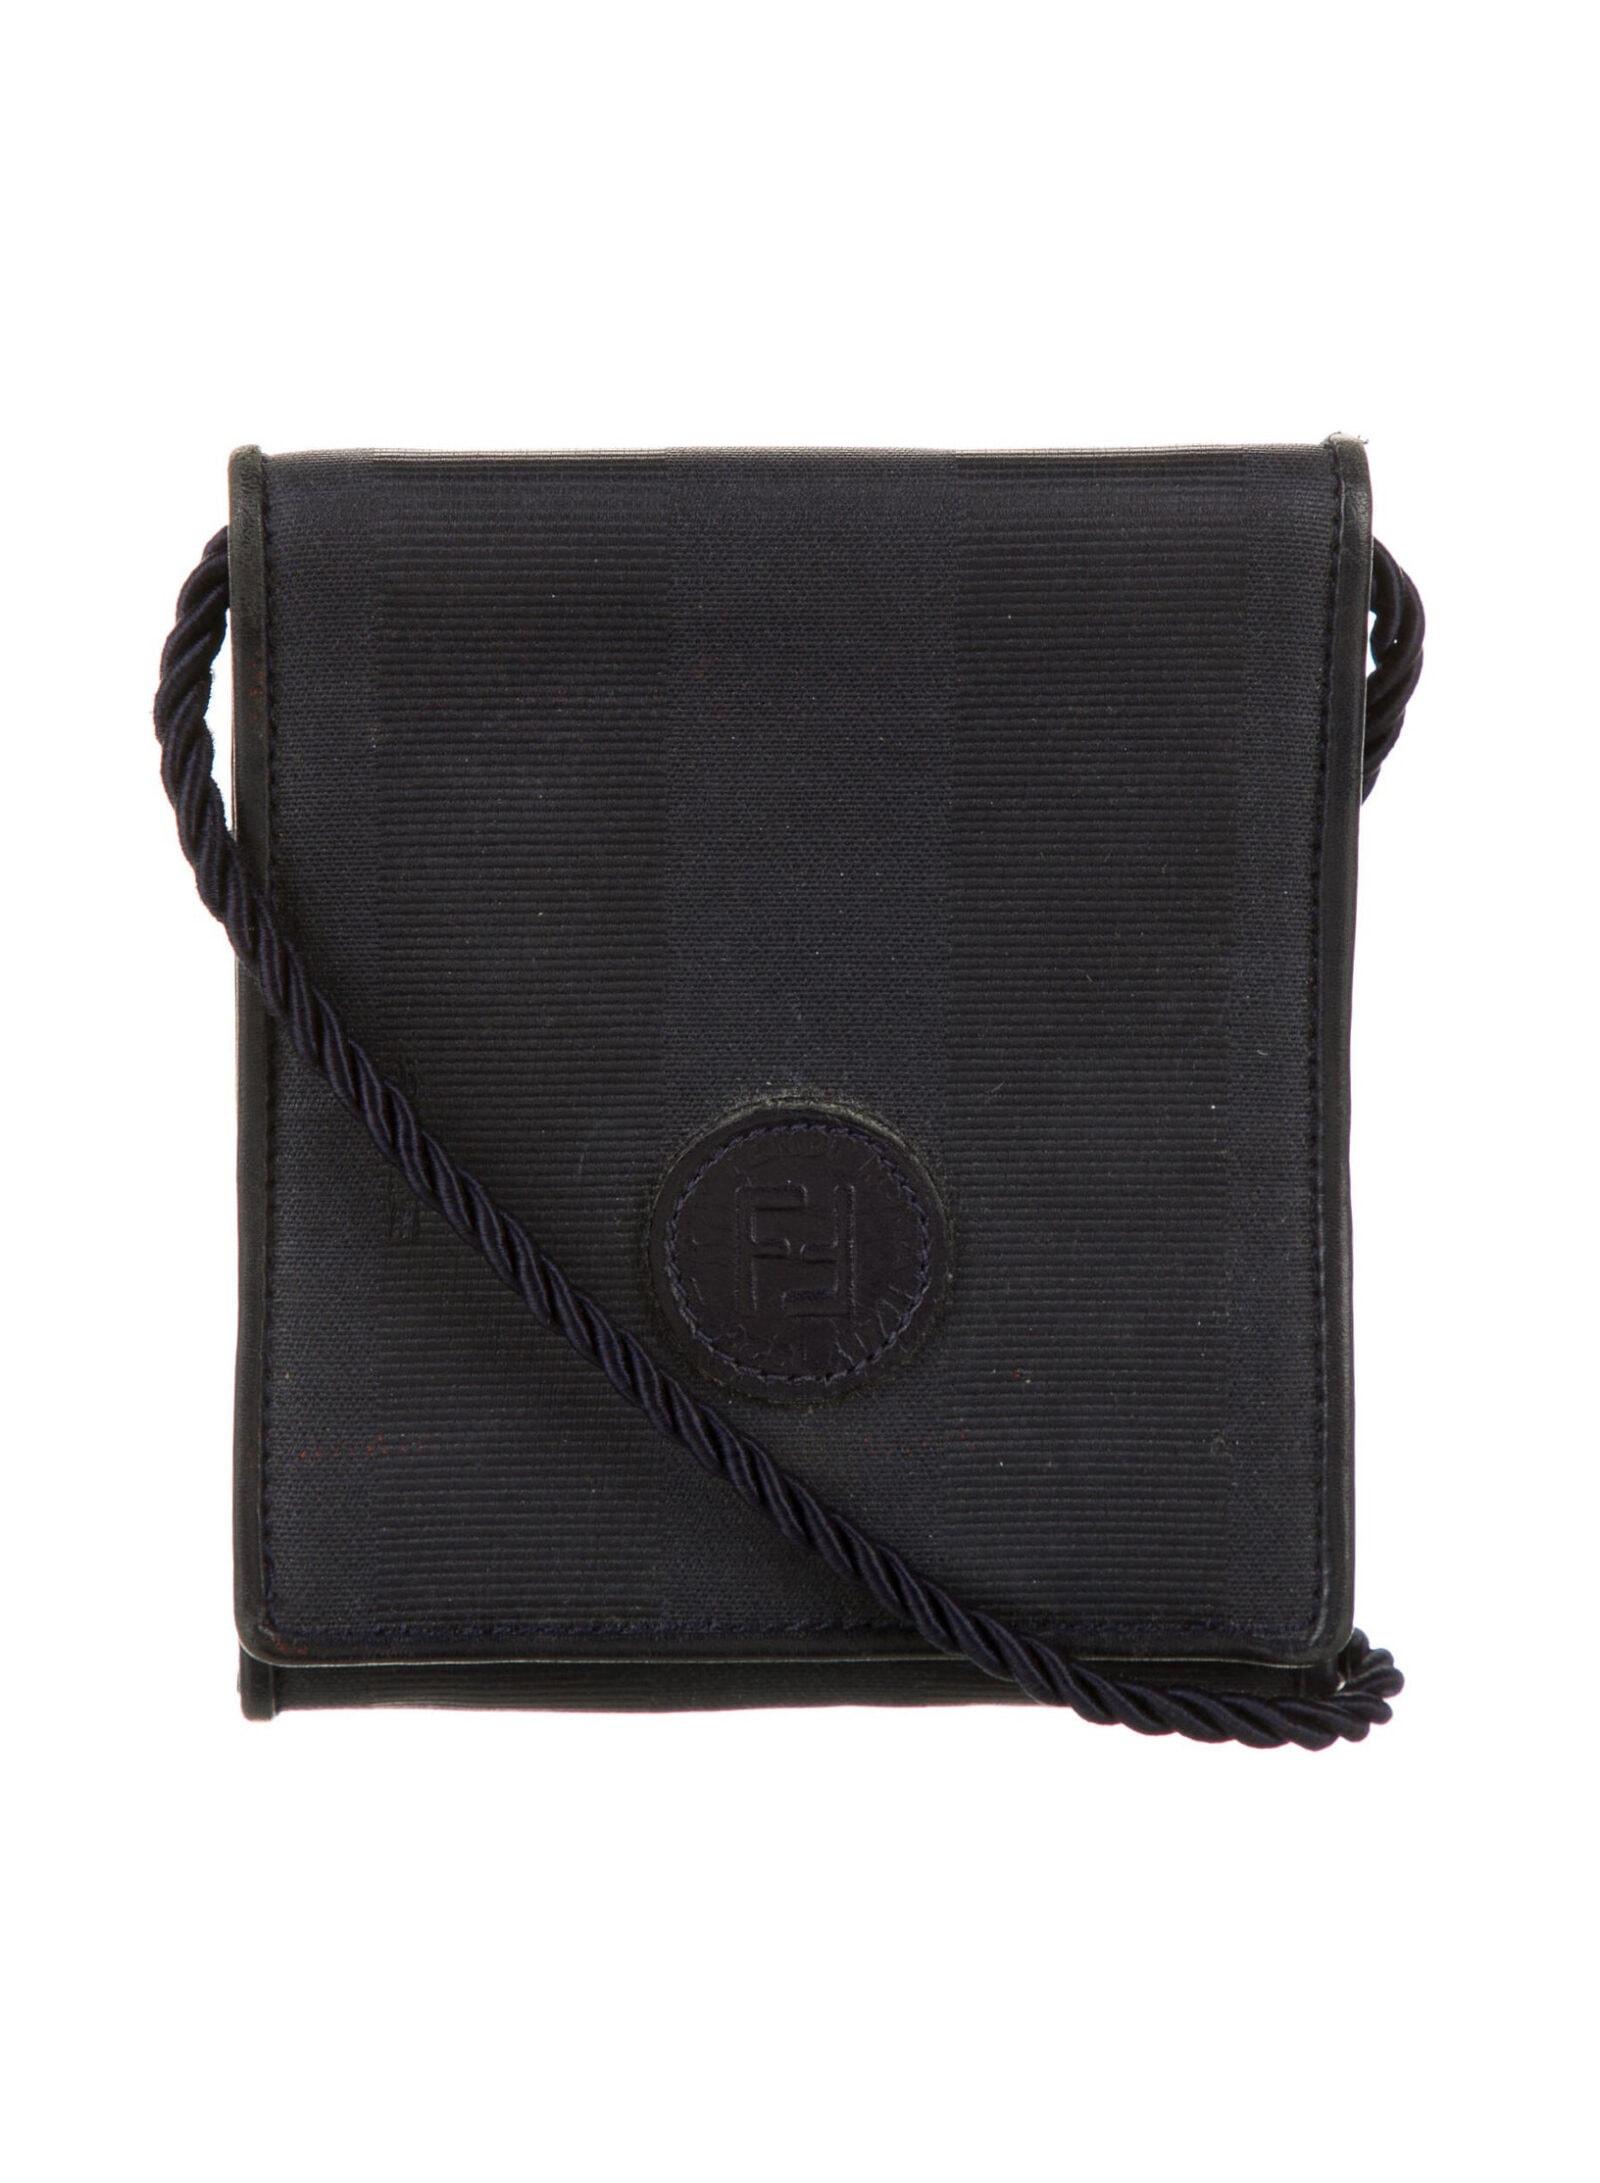 FENDI Vintage Zucca Mini Crossbody Bag